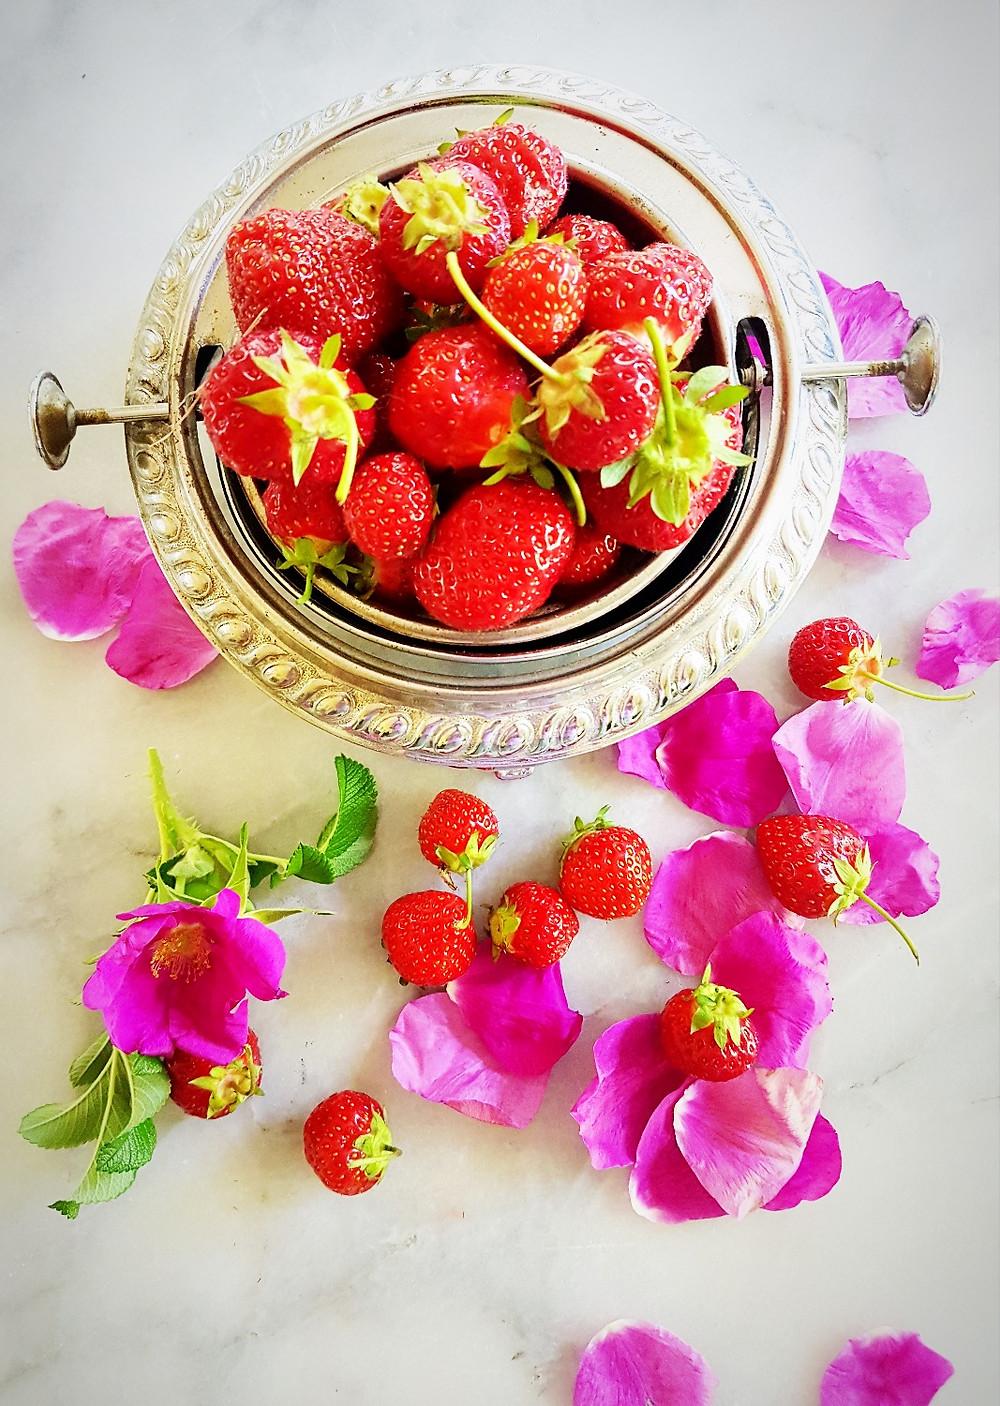 Colleen Thompson Wild Nova Scotia Rose Petals